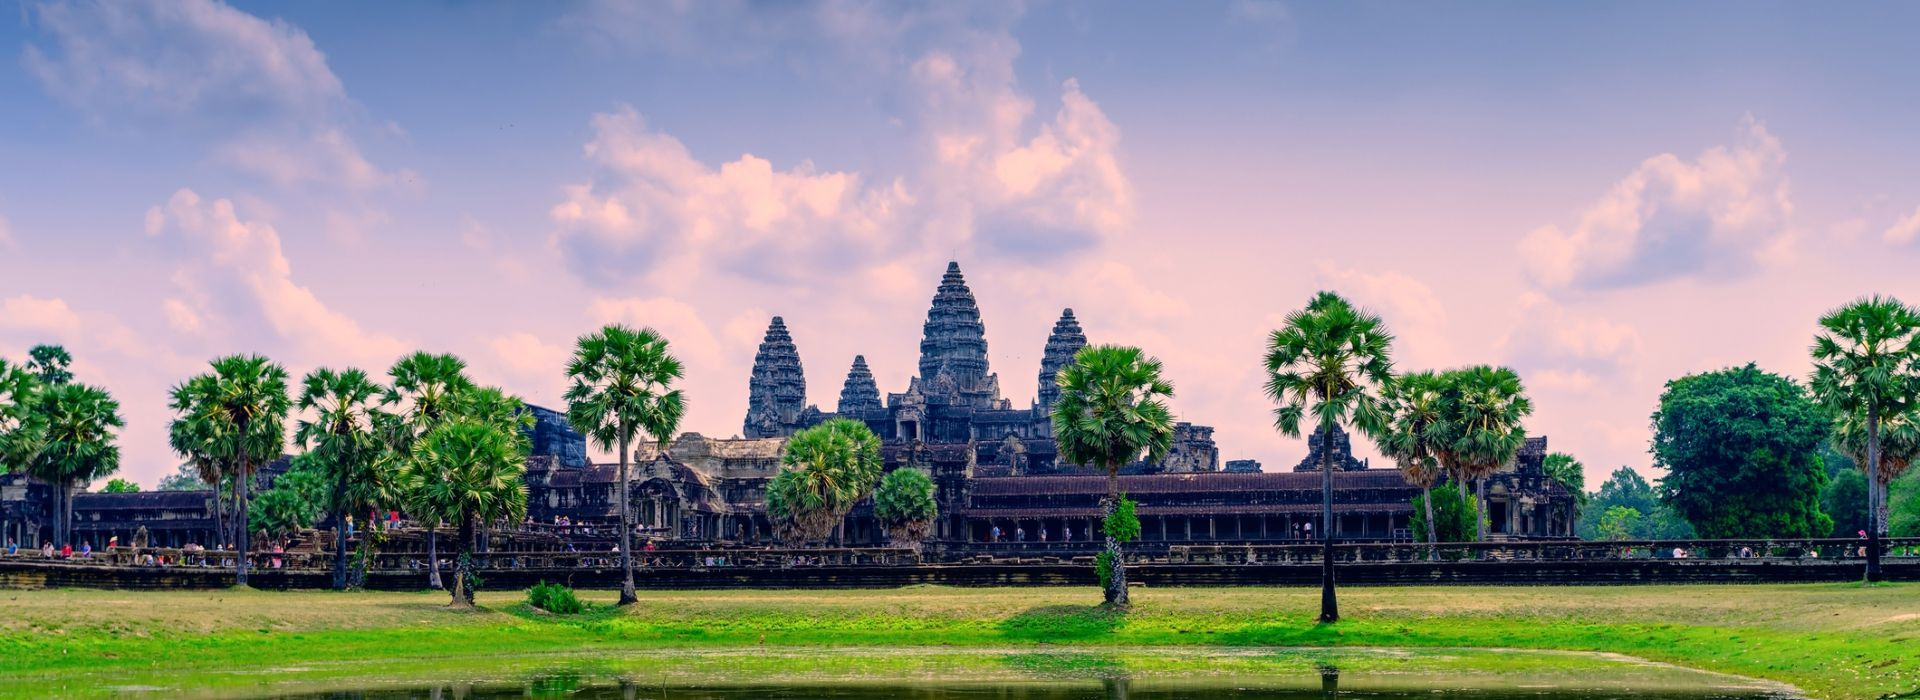 Trekking Tours in Siem Reap